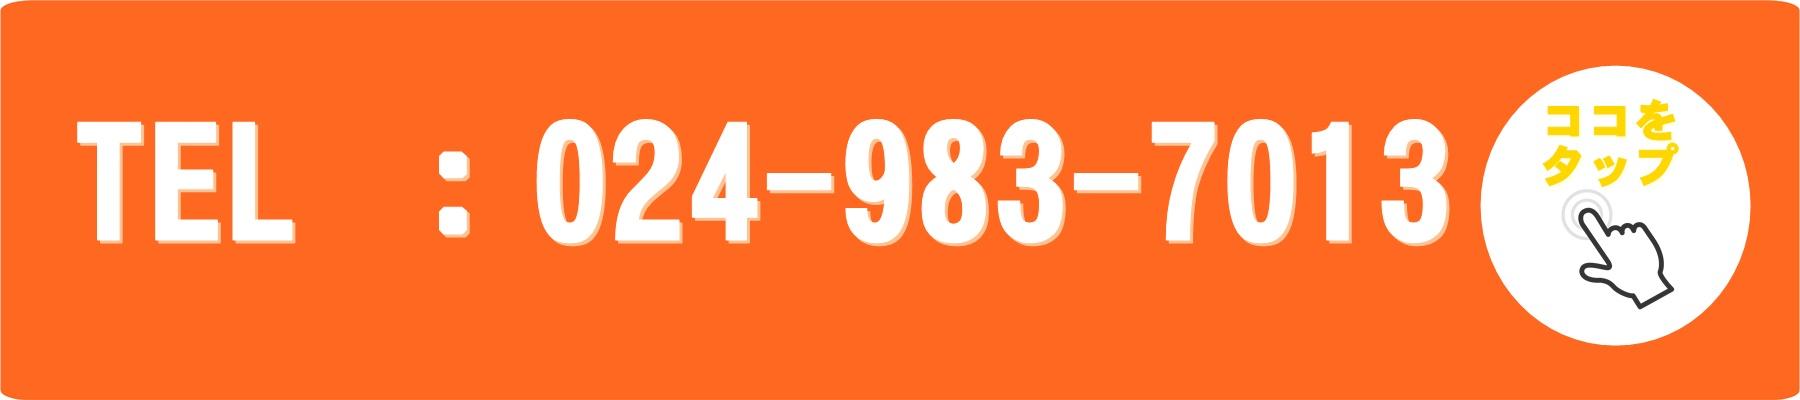 Call: 024-983-7013